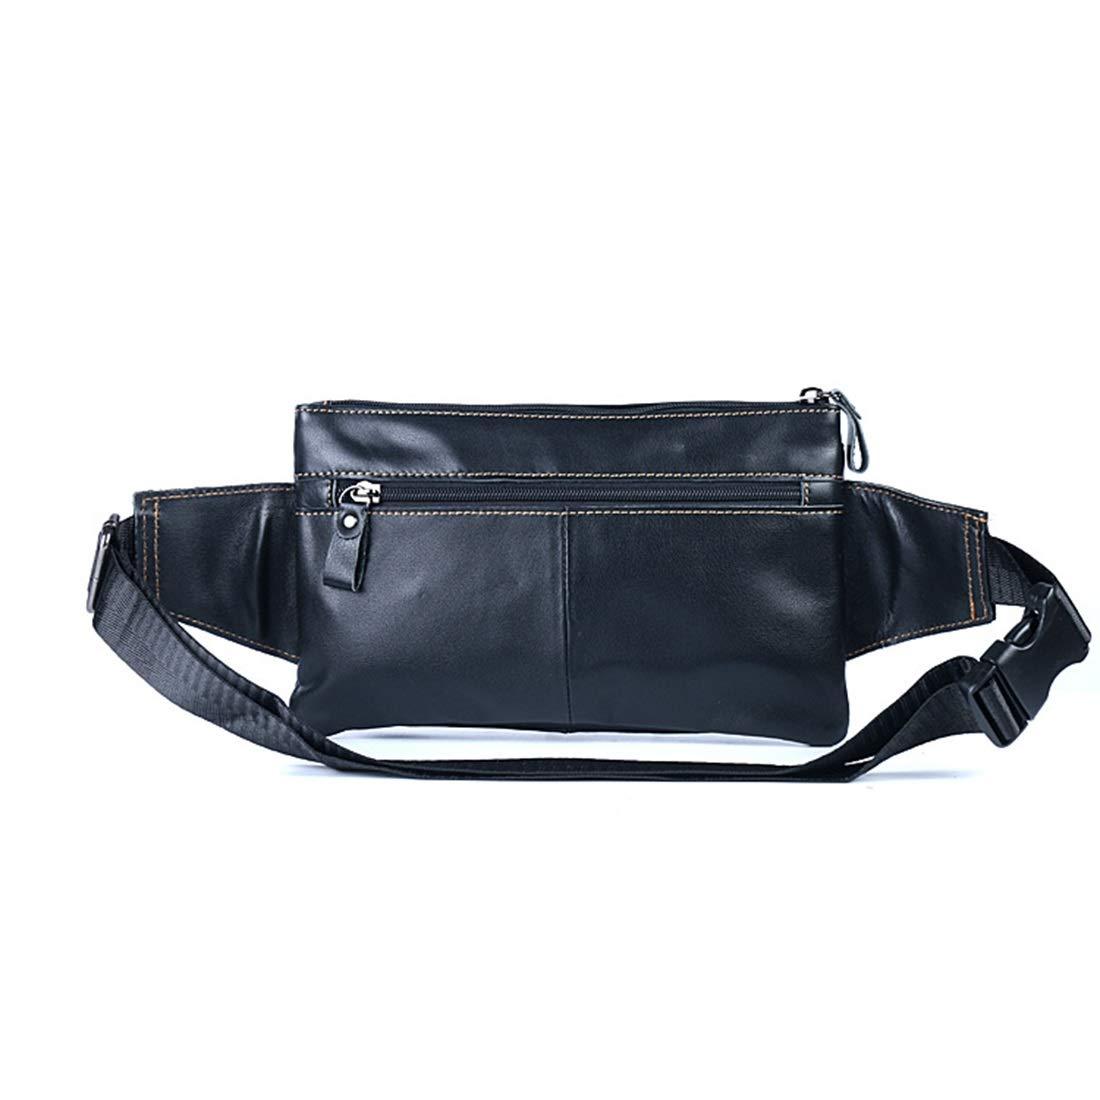 Color : Black RABILTY Fanny Pack Black Waist Bag Travel Hiking Hip Bum Purse Cowhide Travel Neck Pouch